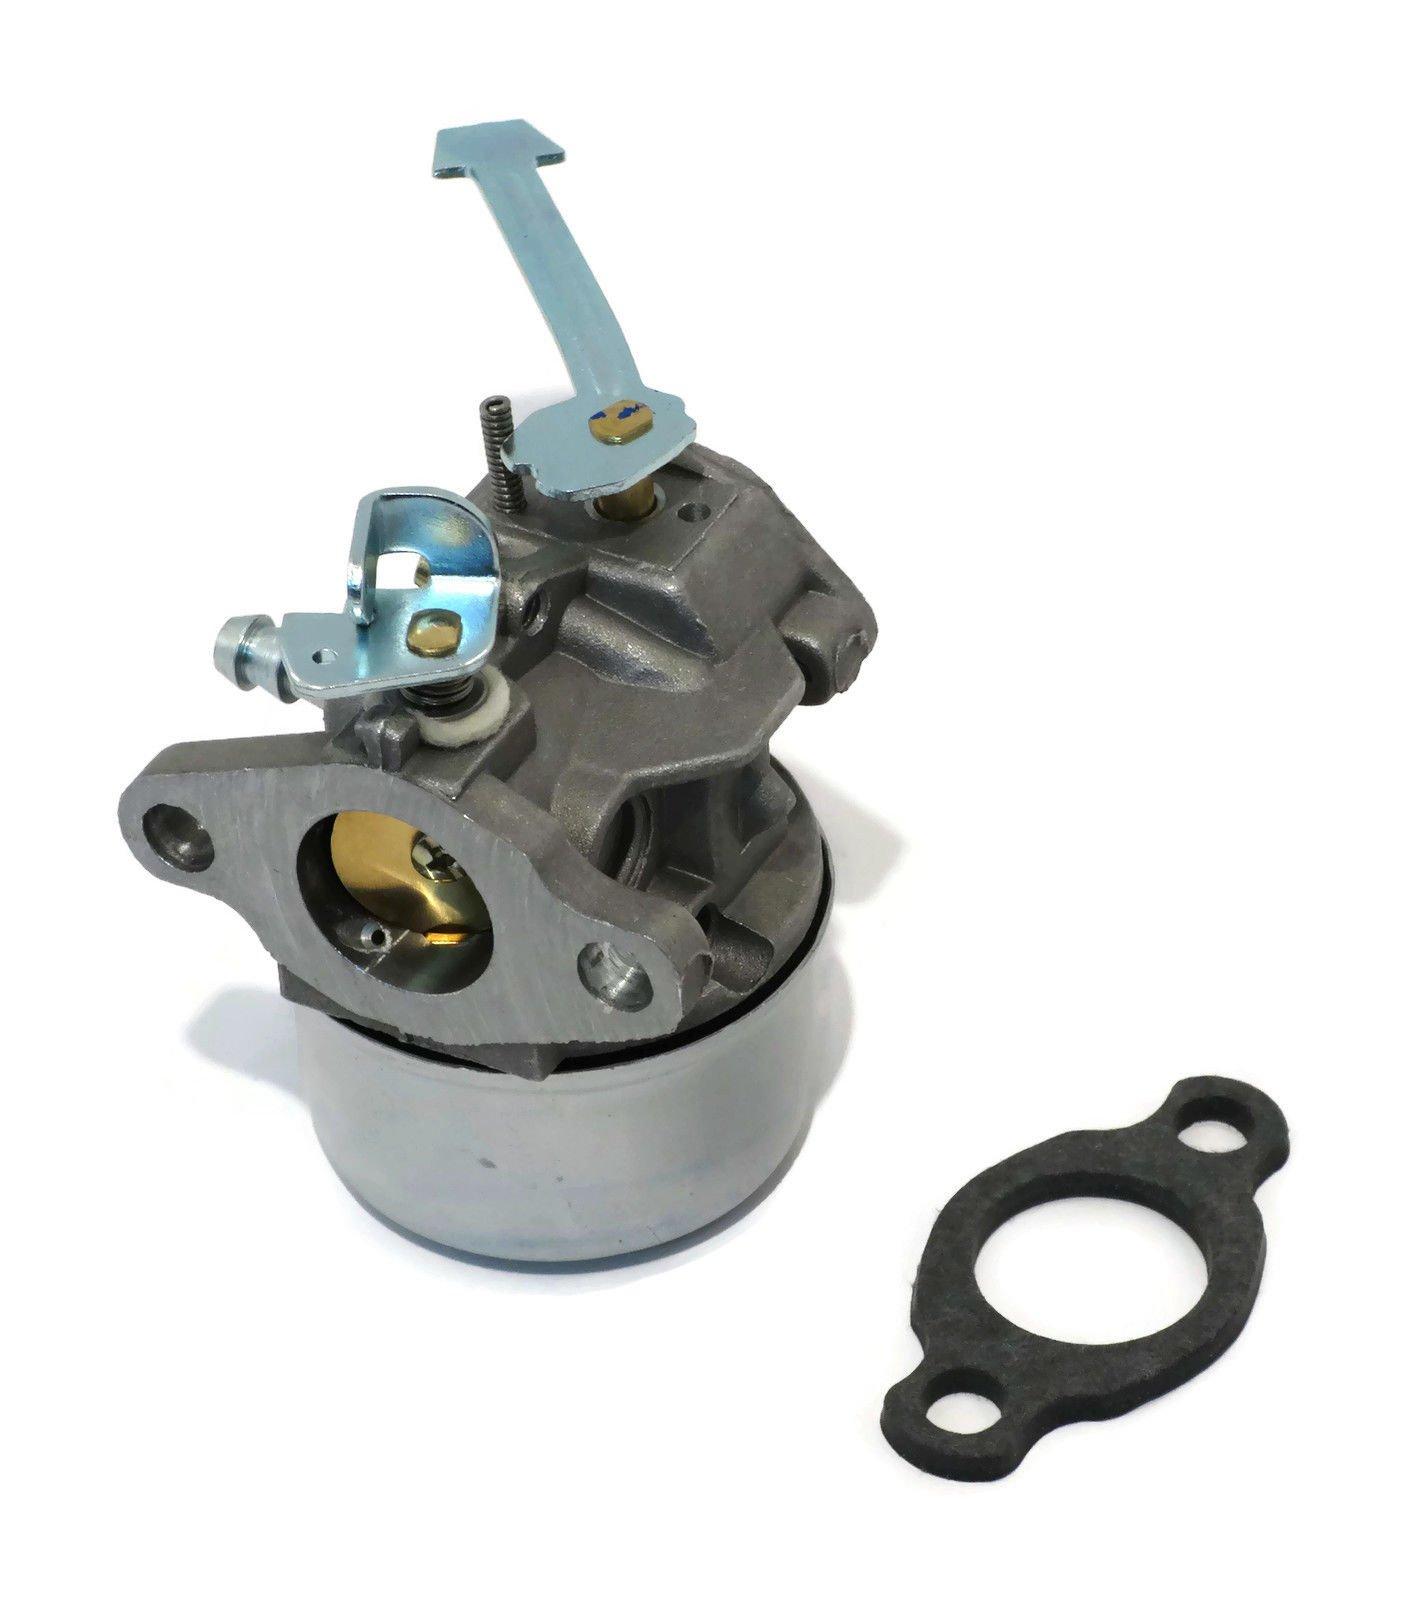 The ROP Shop Carburetor for Toro Powerlite CCR1000 w/ 3 HP Tecumseh Sears Craftsman MTD Carb by The ROP Shop